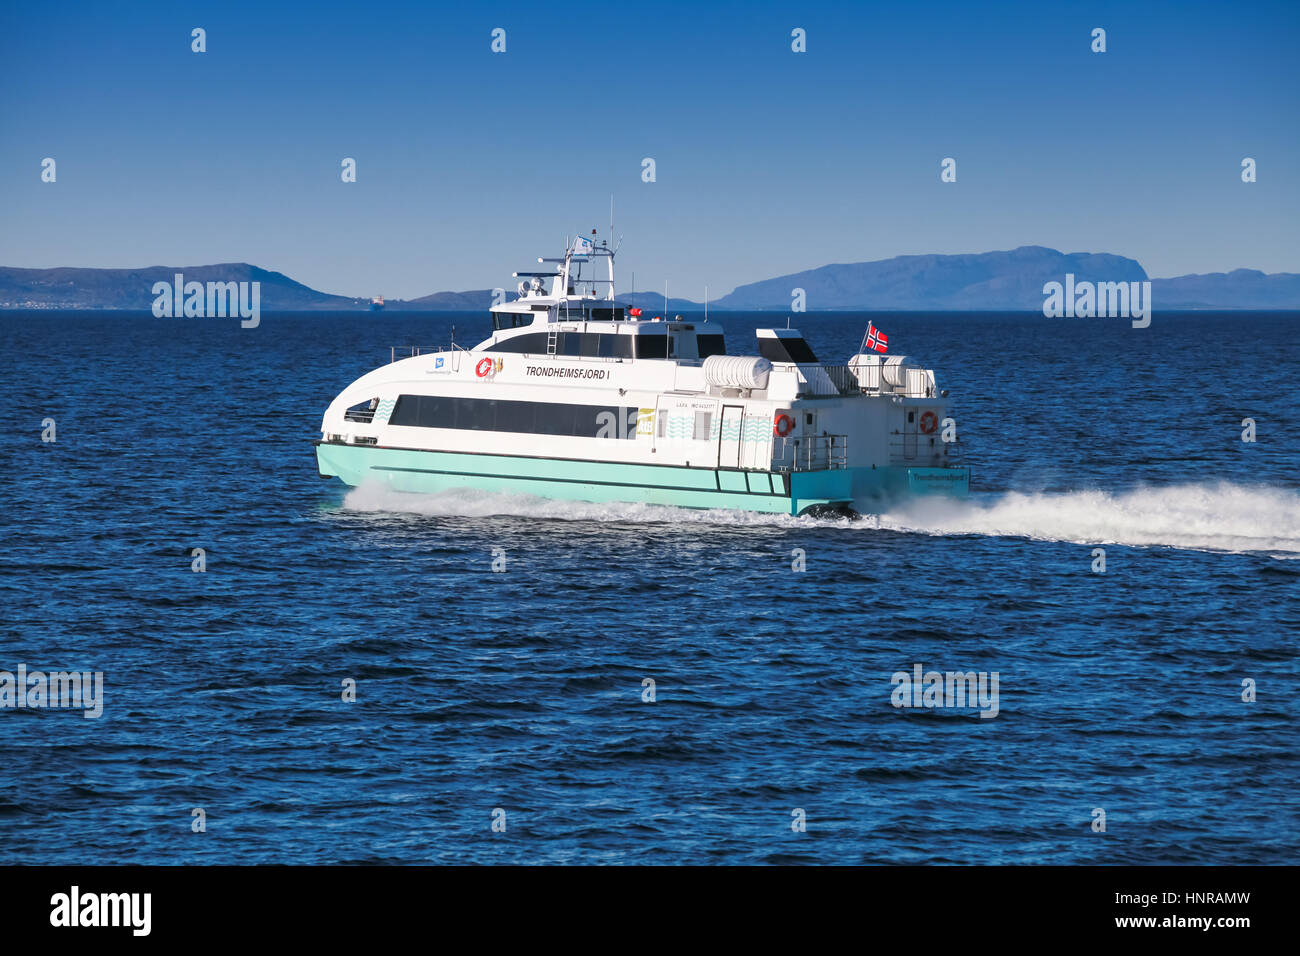 Trondheim, Norway - October 17, 2016: Fast passenger ferry boat Trondheimsfjord I goes on Norwegian sea. Trondheim, - Stock Image